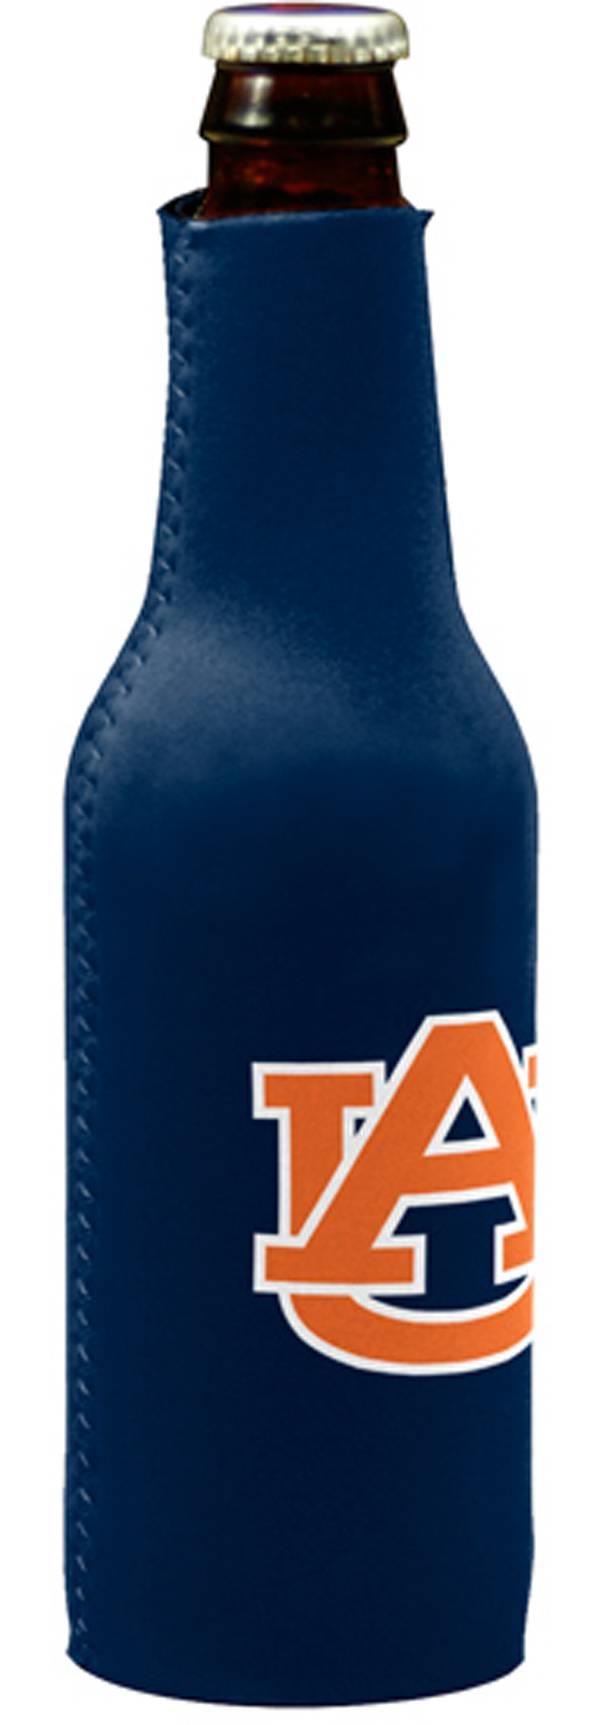 Auburn Tigers Bottle Koozie product image